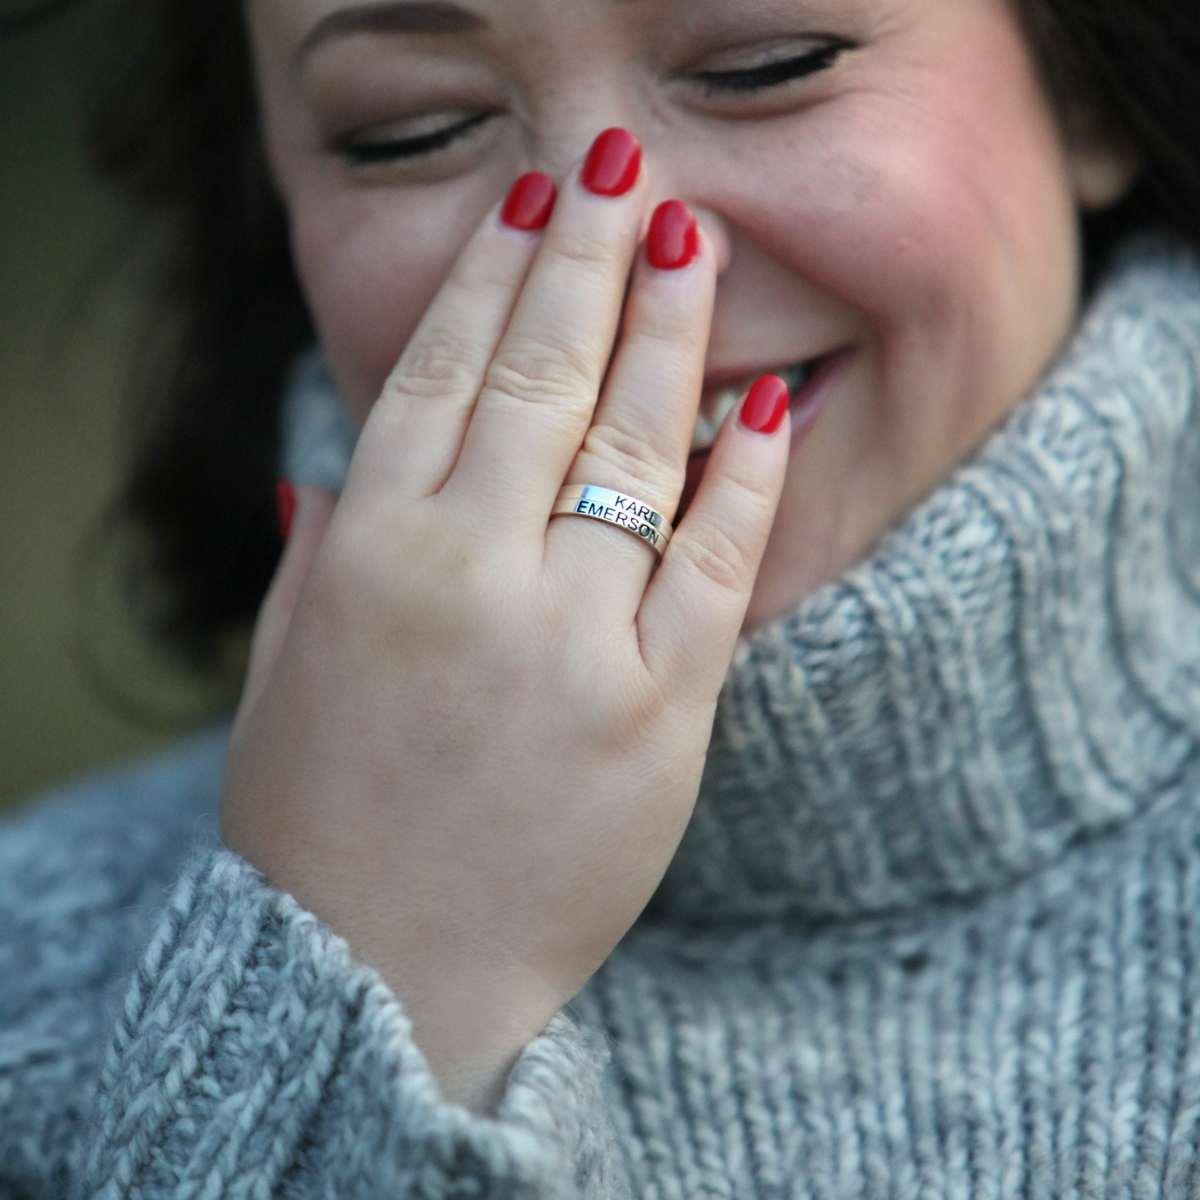 sterling silver personalized rings - wardrobe oxygen